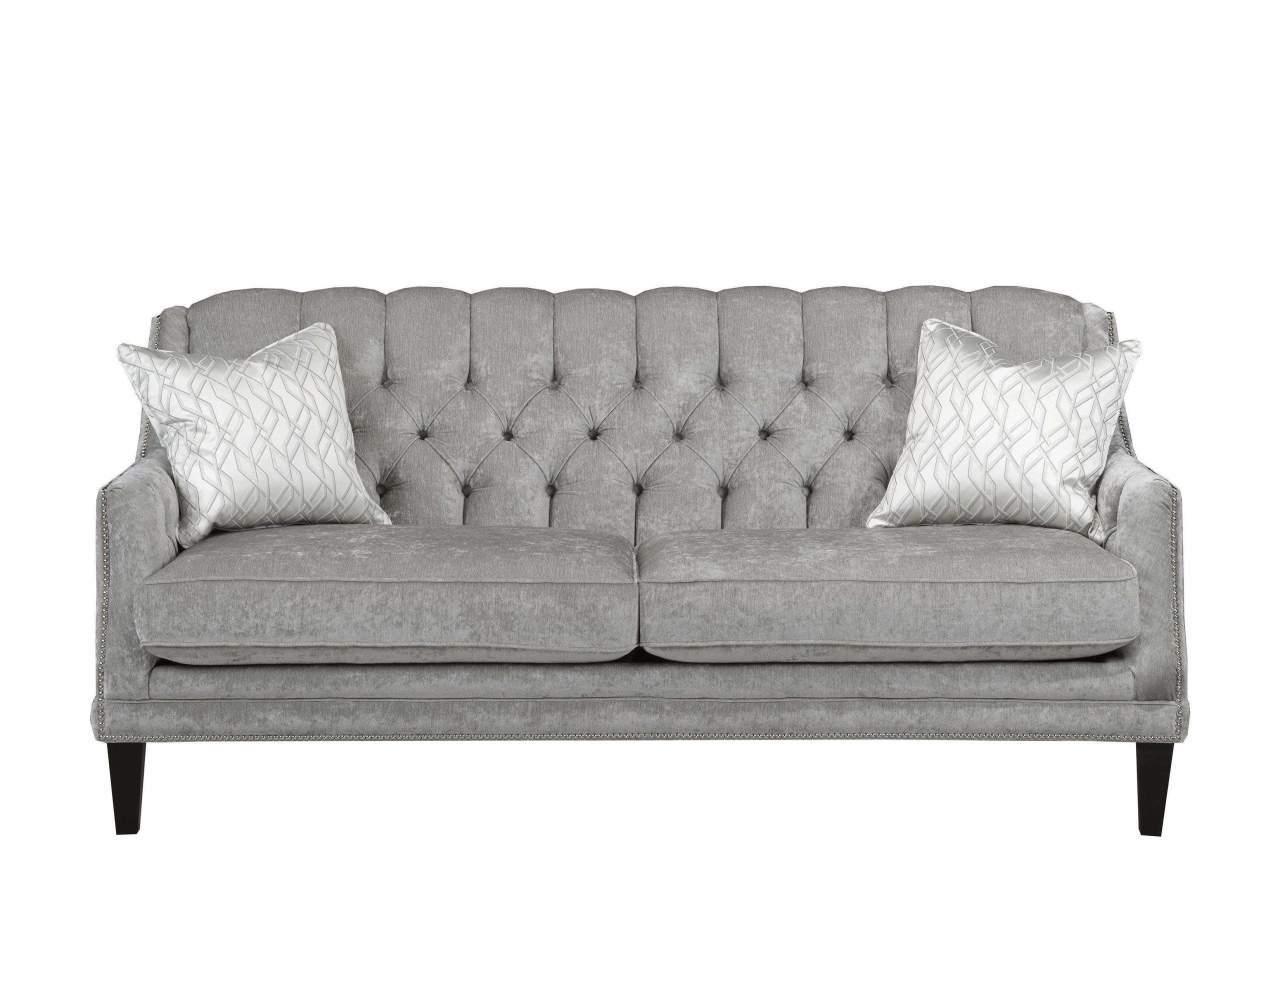 luxus garten frisch japan sofa bed couch bett procura home blog japan sofa bed of luxus garten